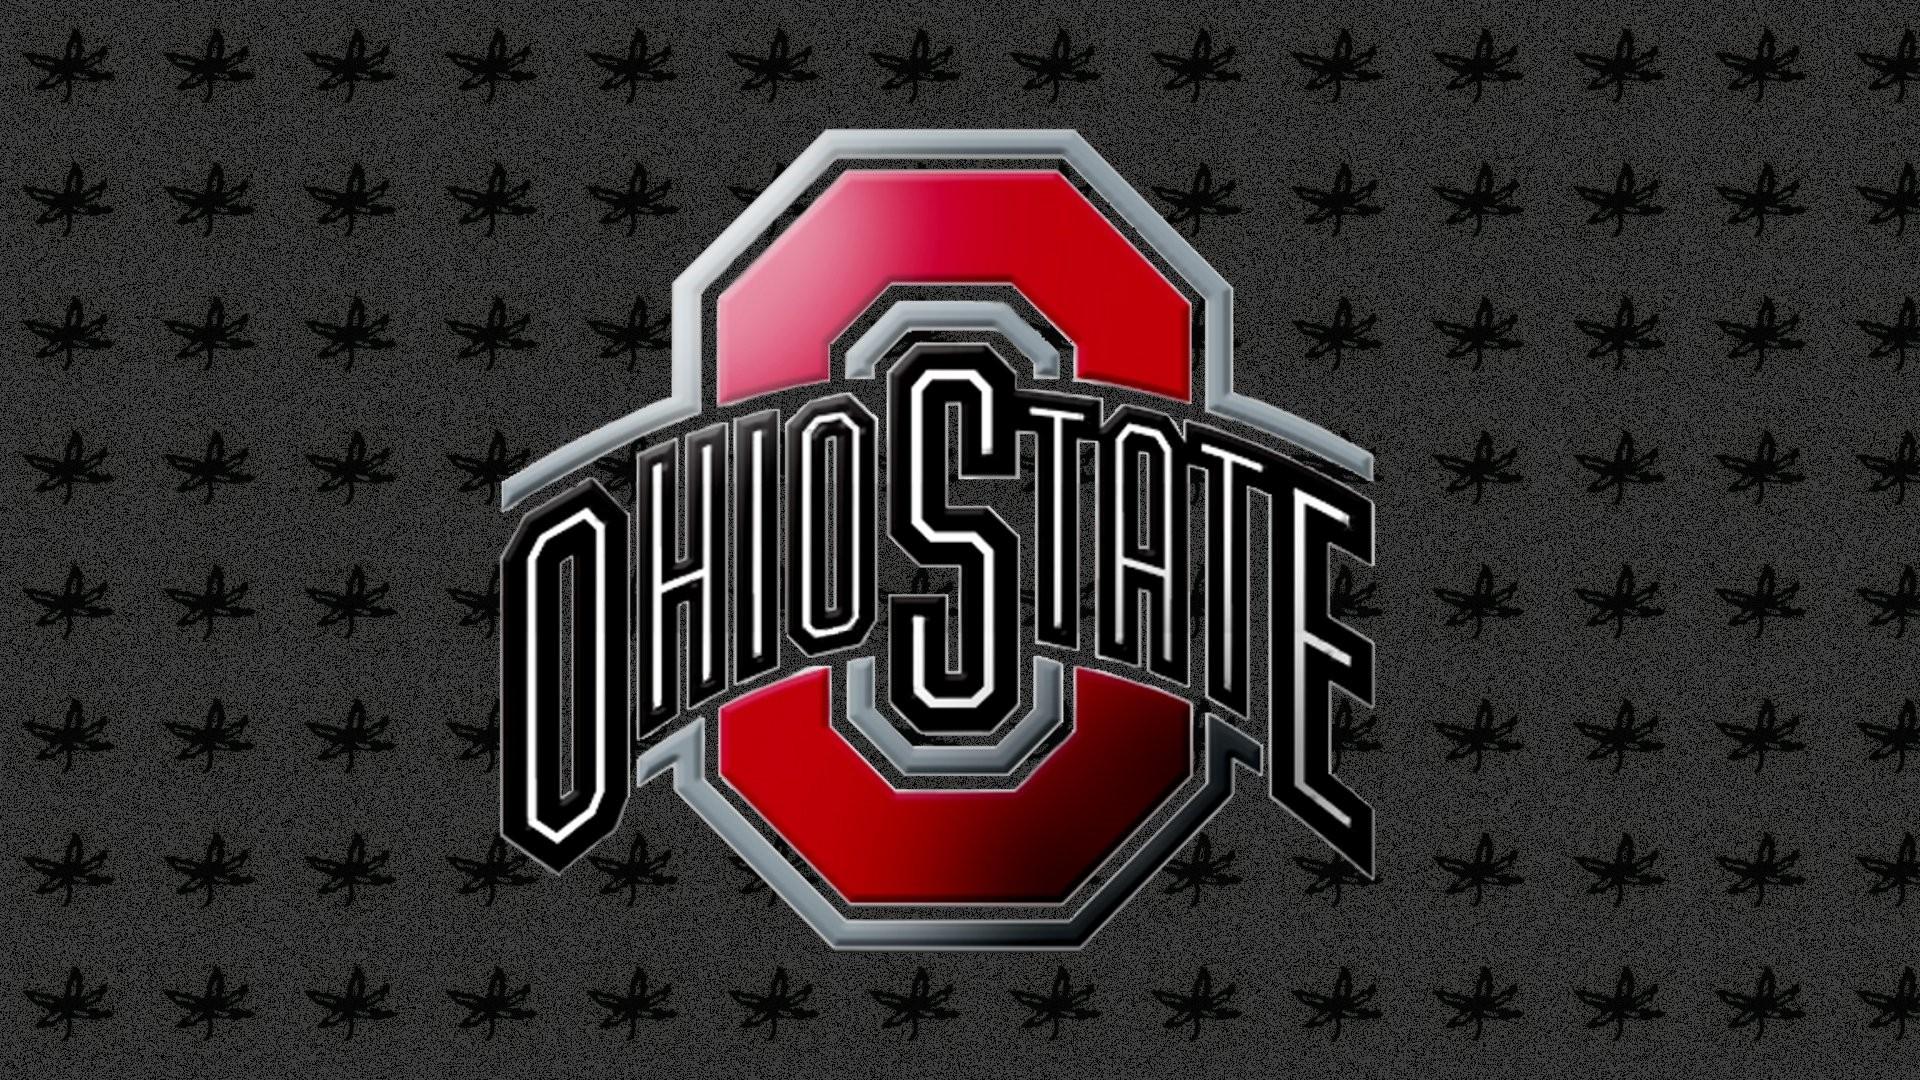 Ohio State Background